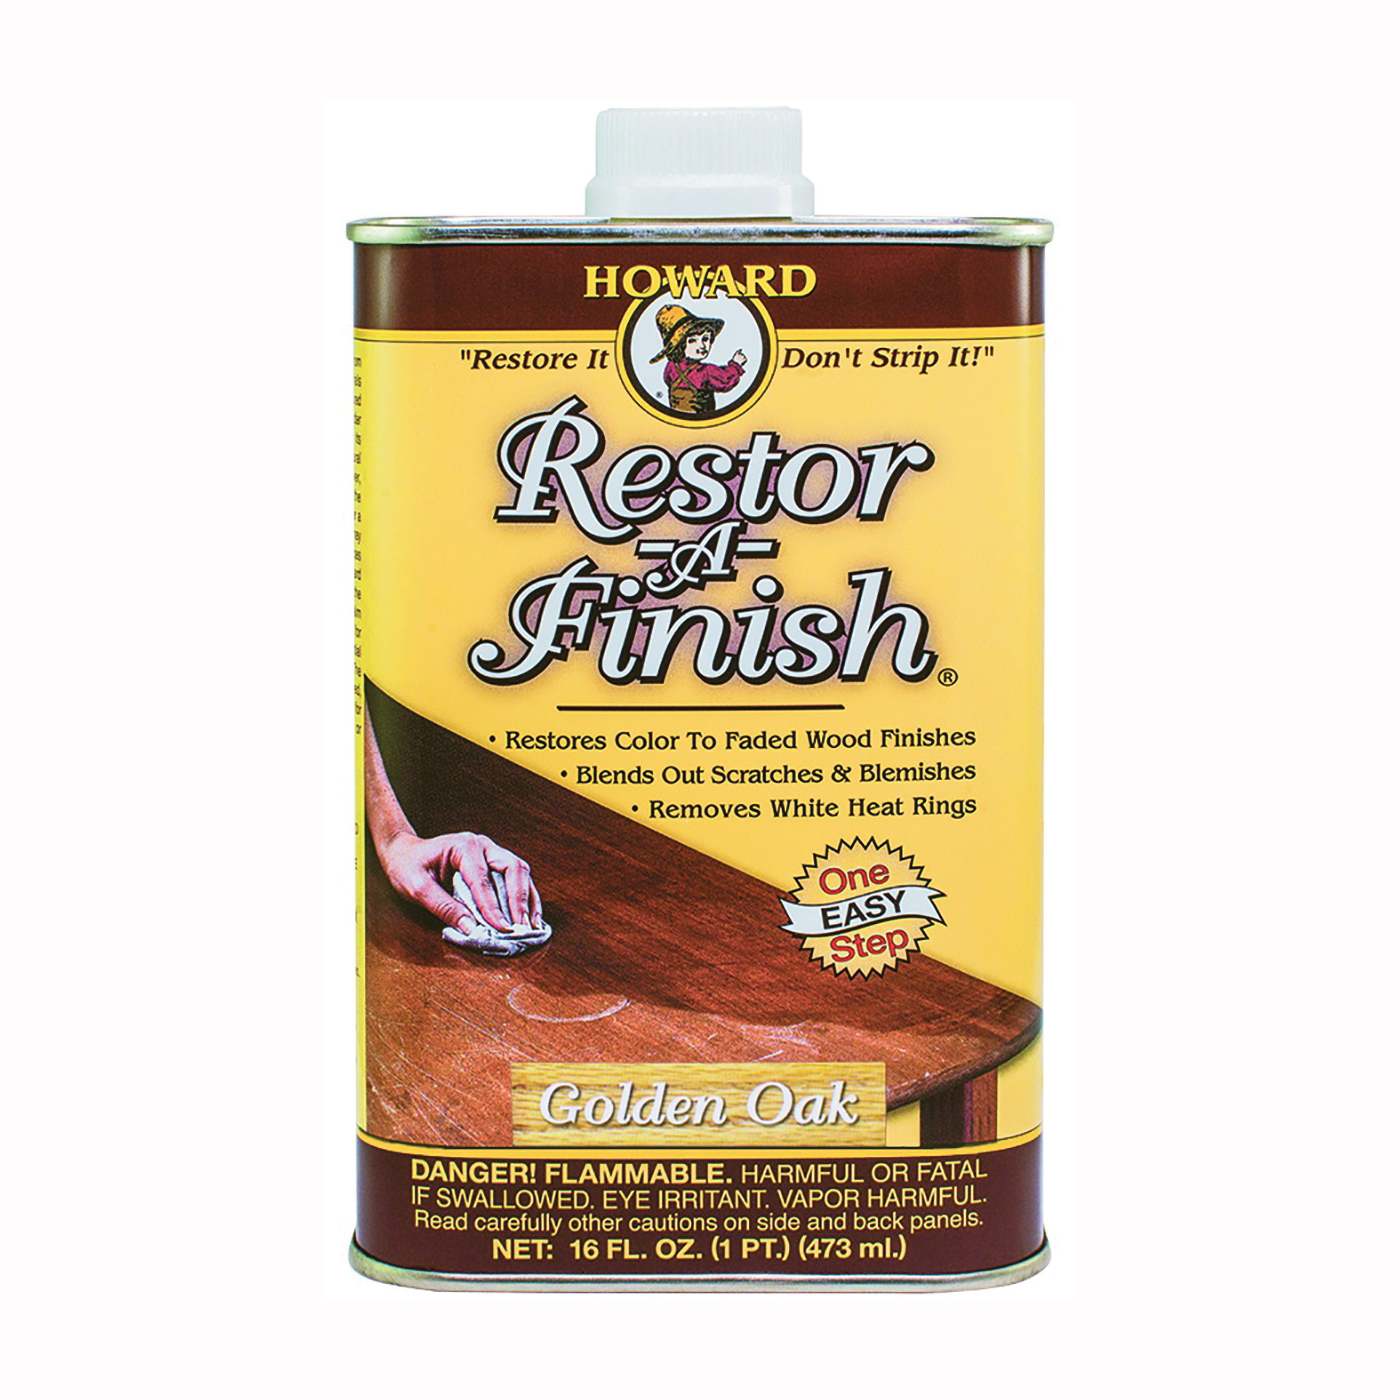 Picture of HOWARD RF3016 Wood Restorer, Golden Oak, Liquid, 16 oz, Can